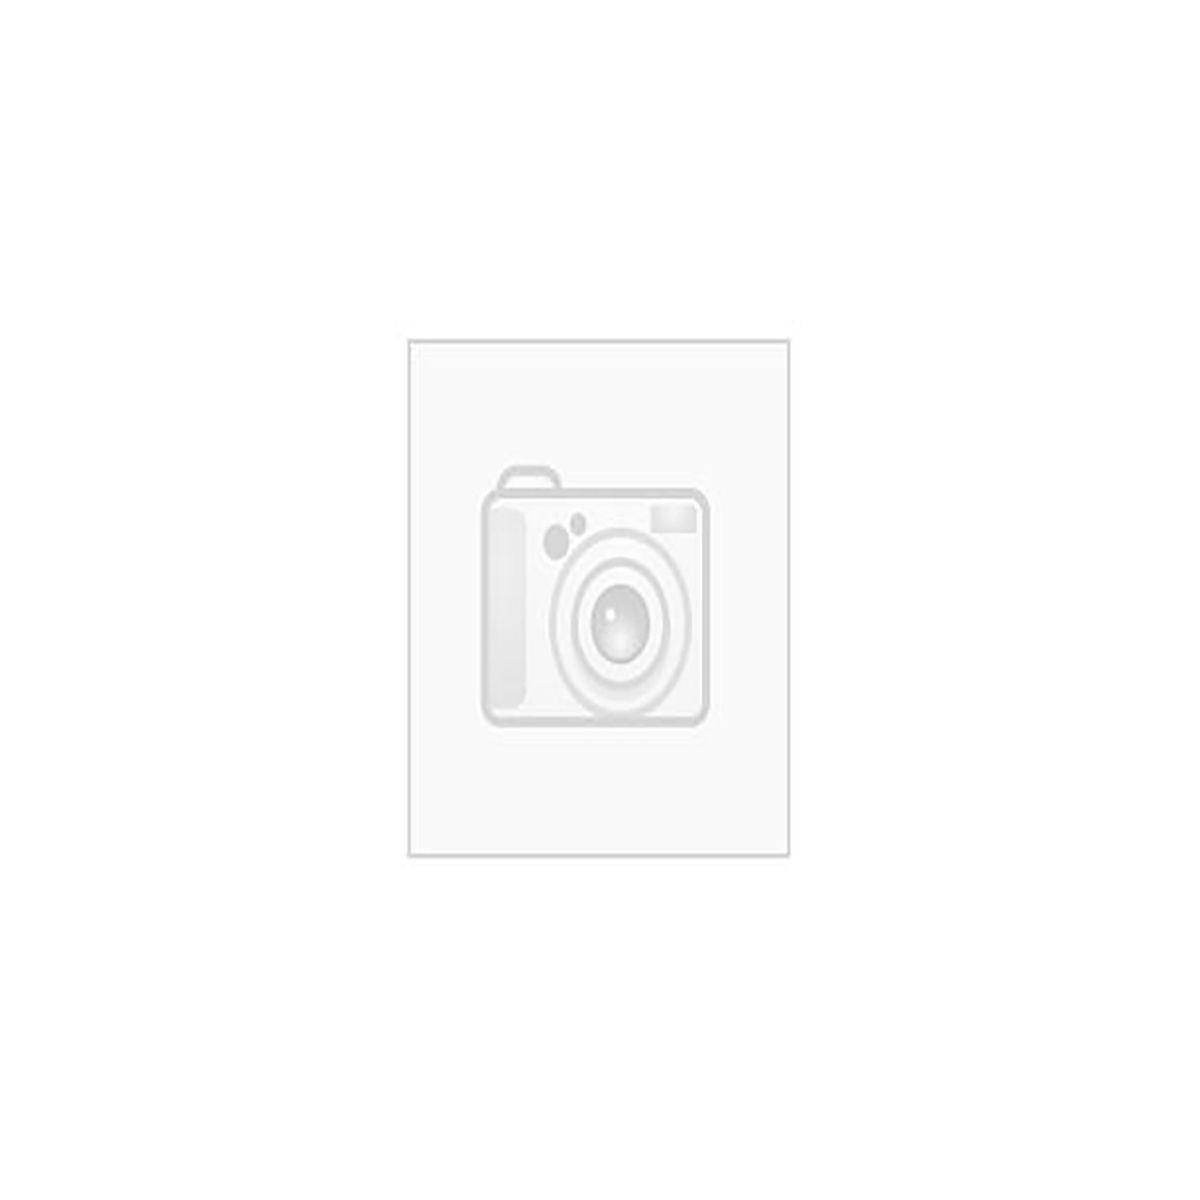 Intra - VK50PK for vegg – Vaskekar